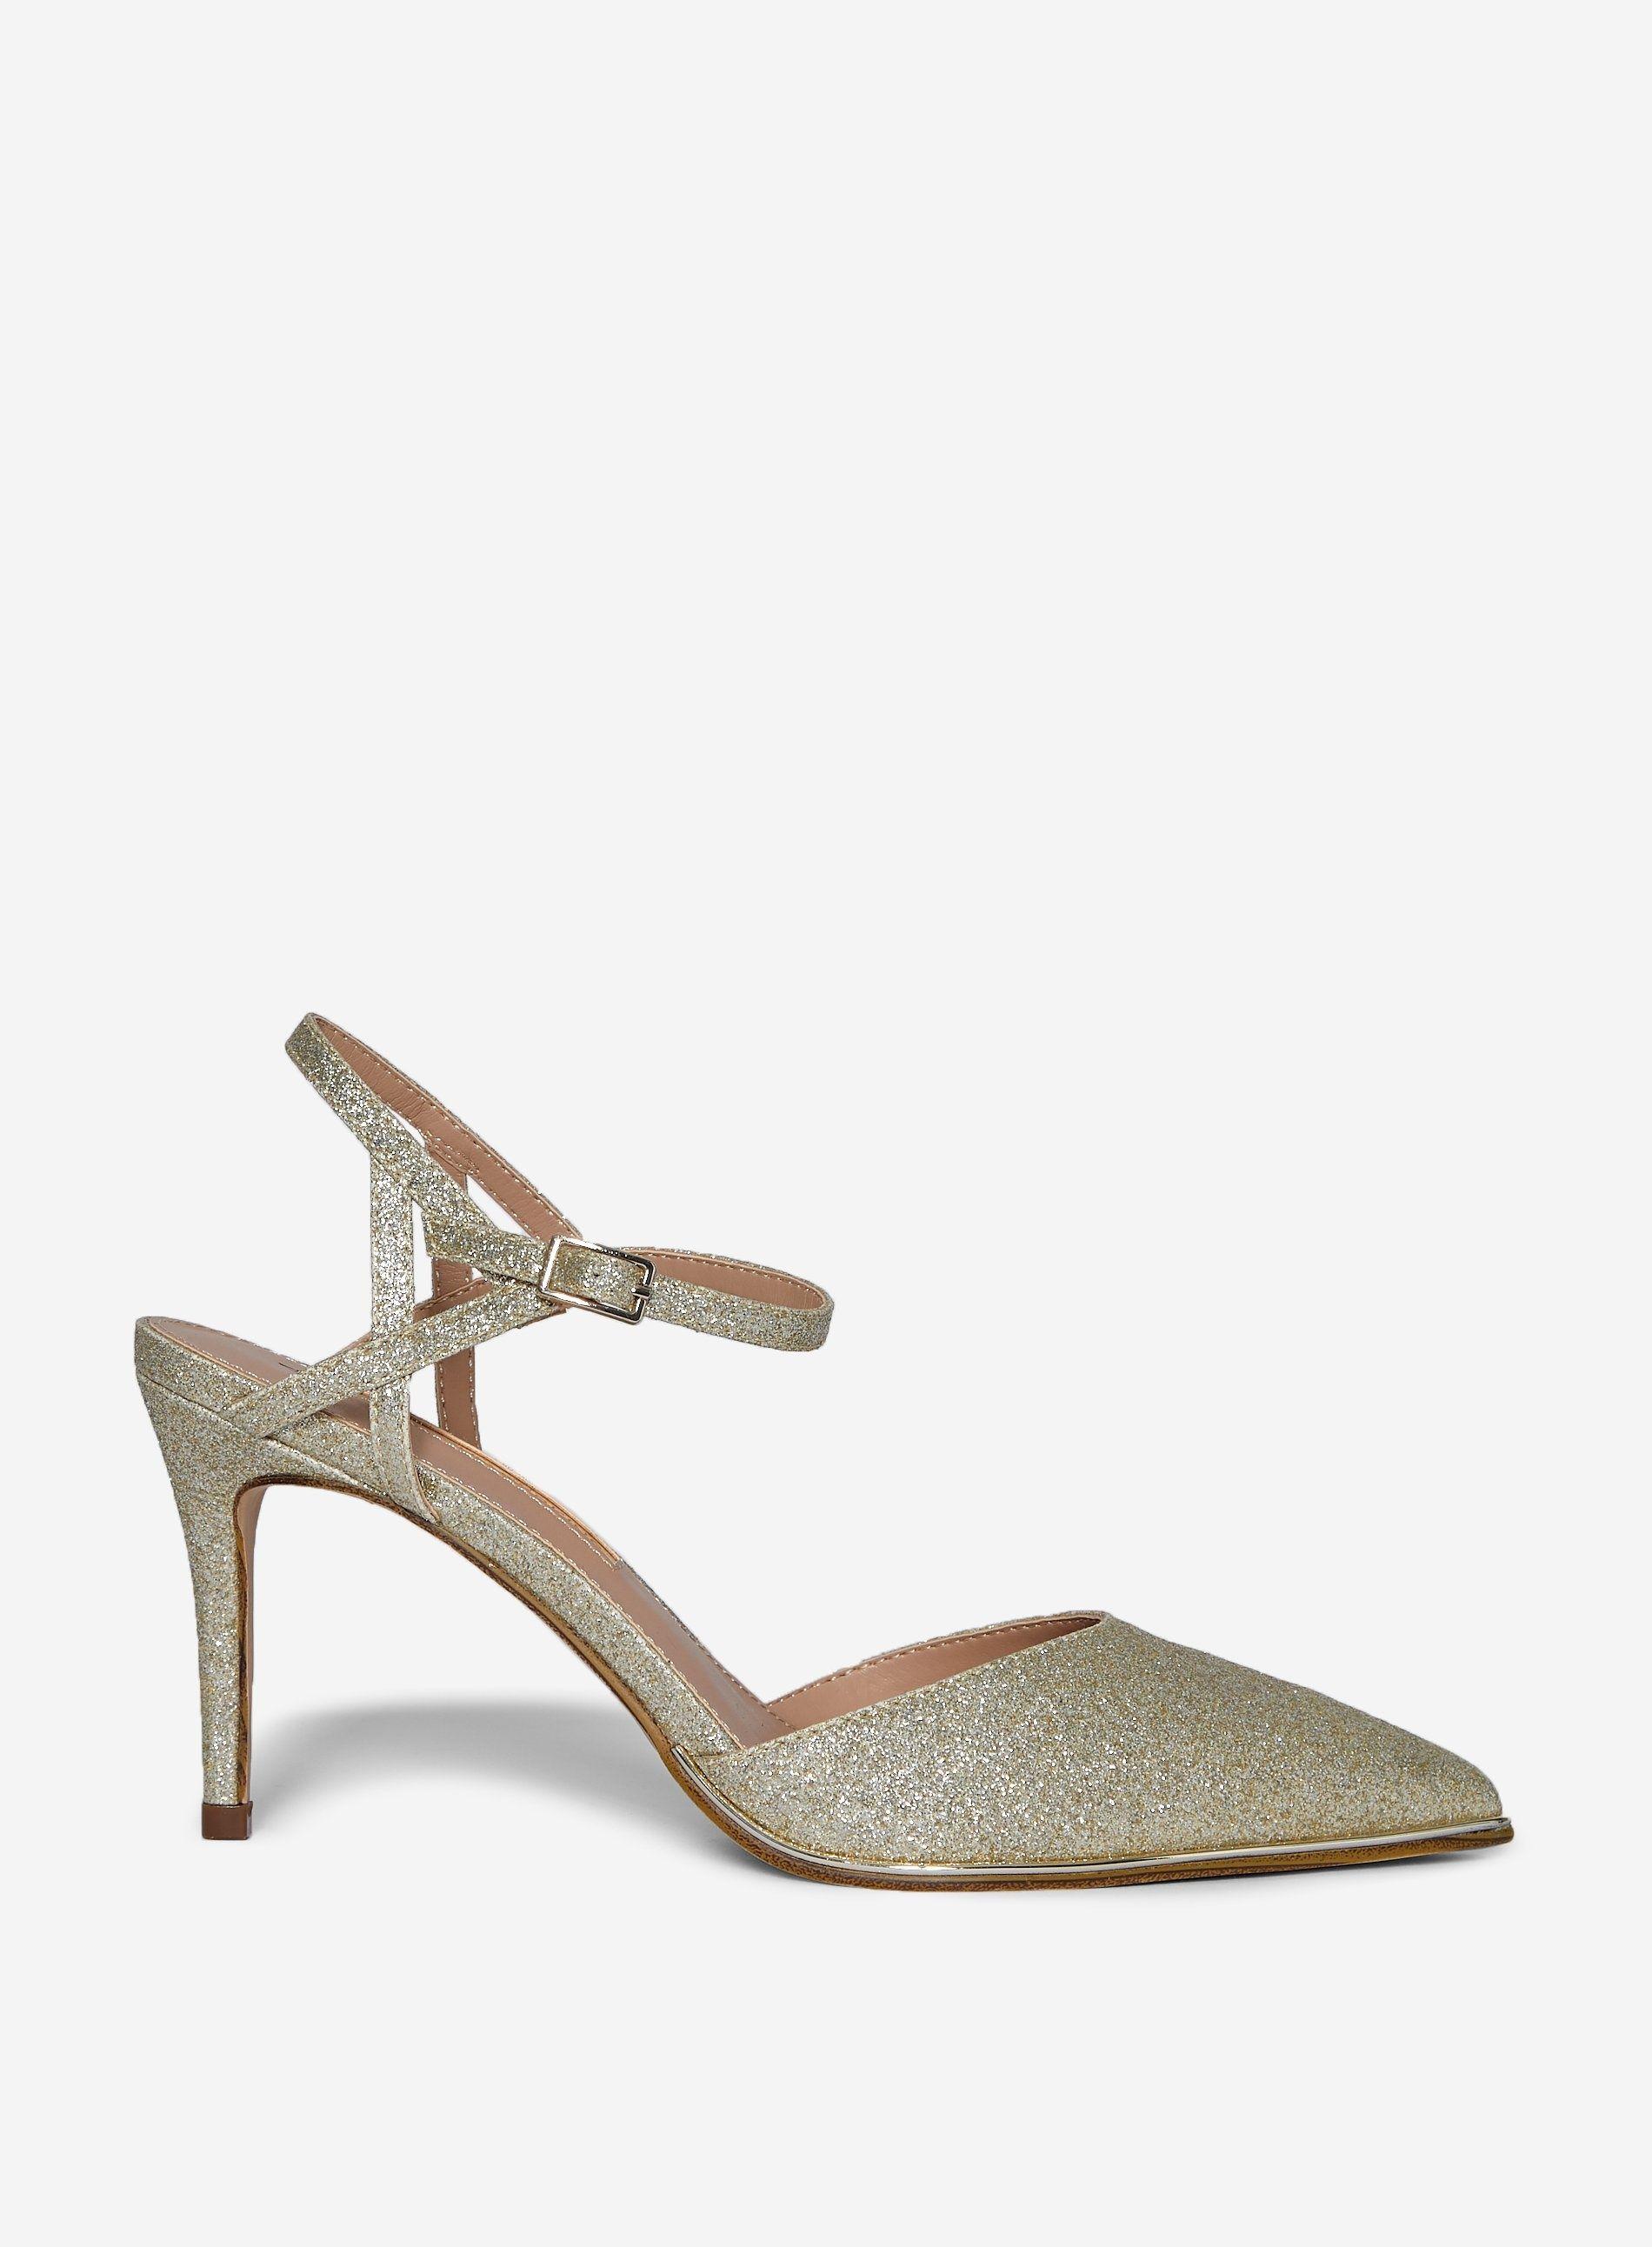 Dorothy Perkins Womens Gold Elfie Court Shoes Stiletto Heels Pumps Pointed